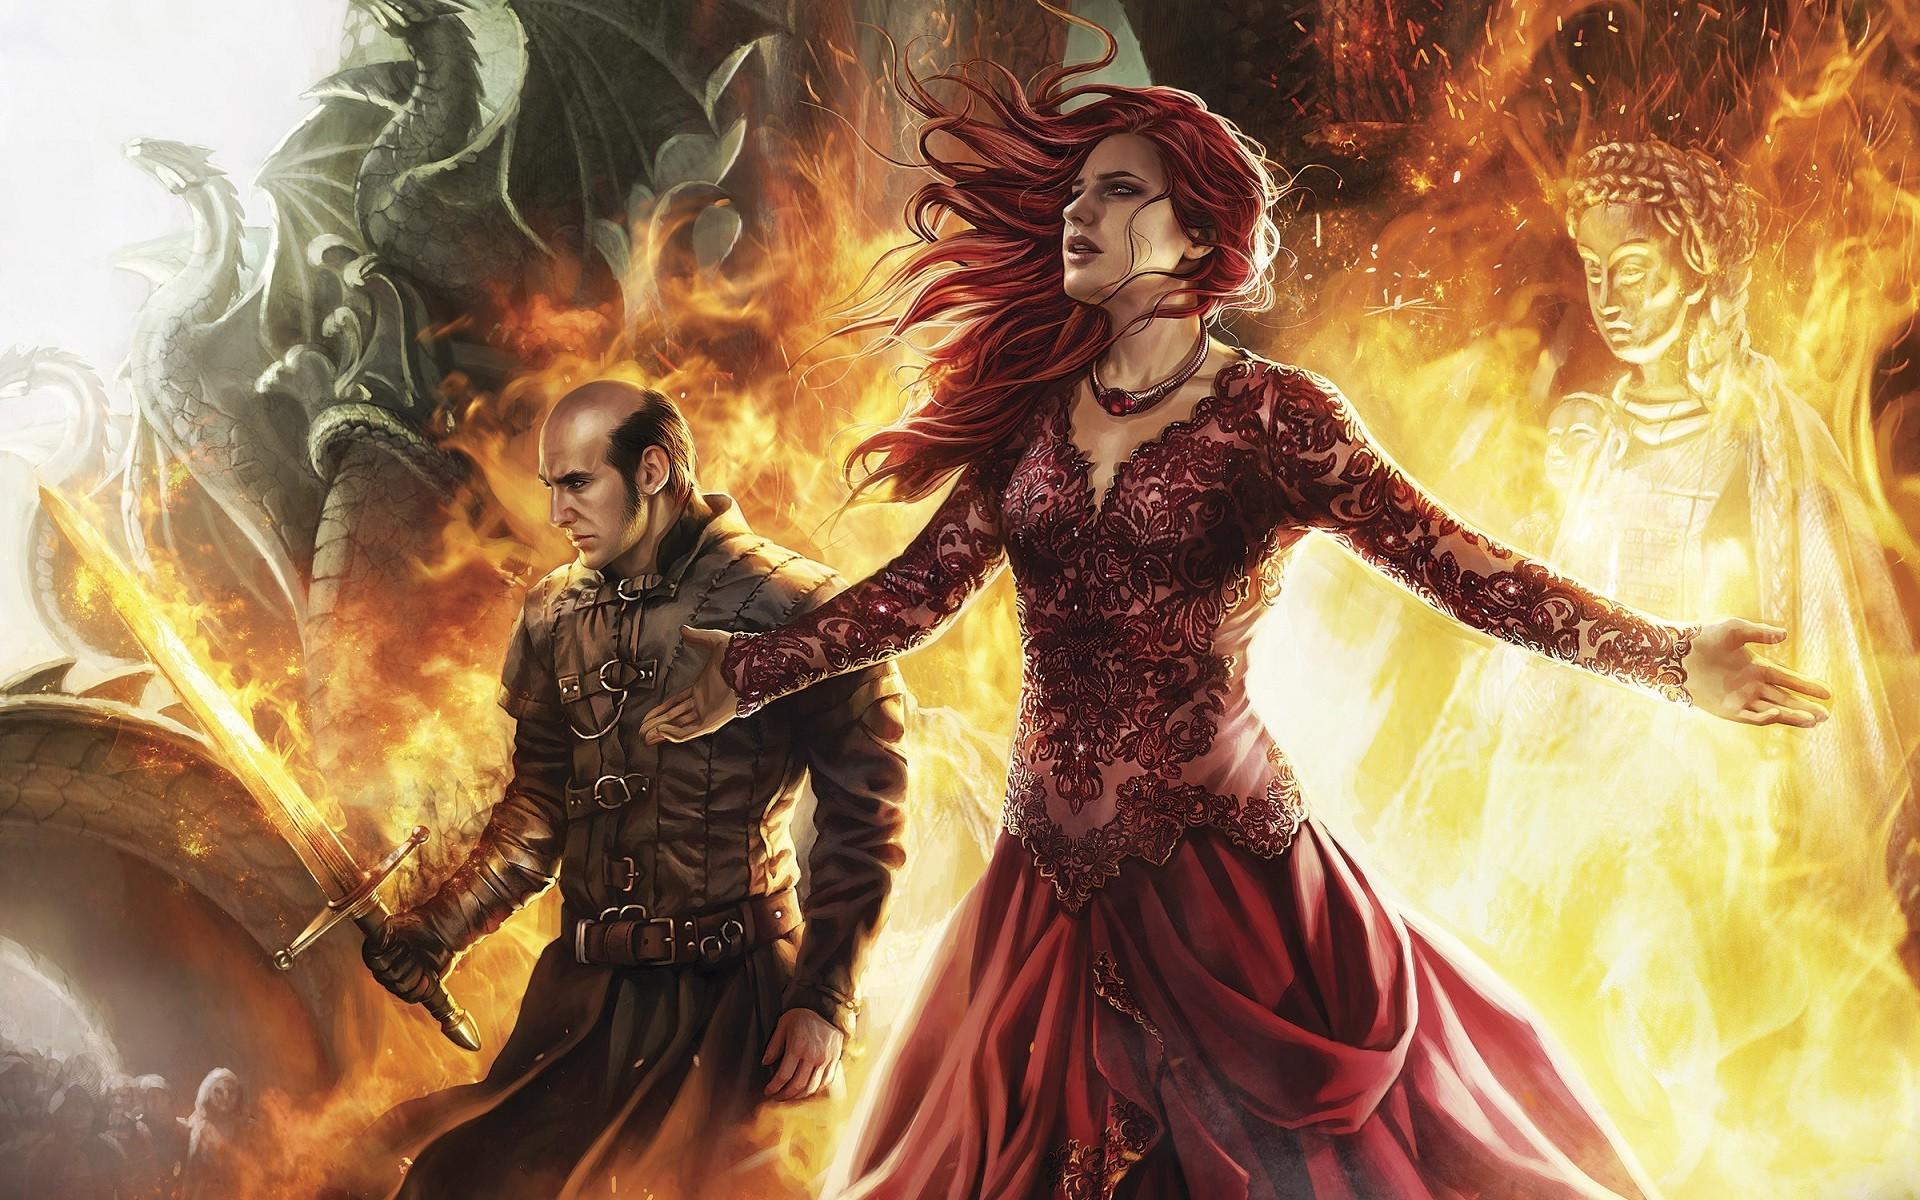 Artwork Fantasy Art Game Of Thrones Fire Statue Dragon Sword